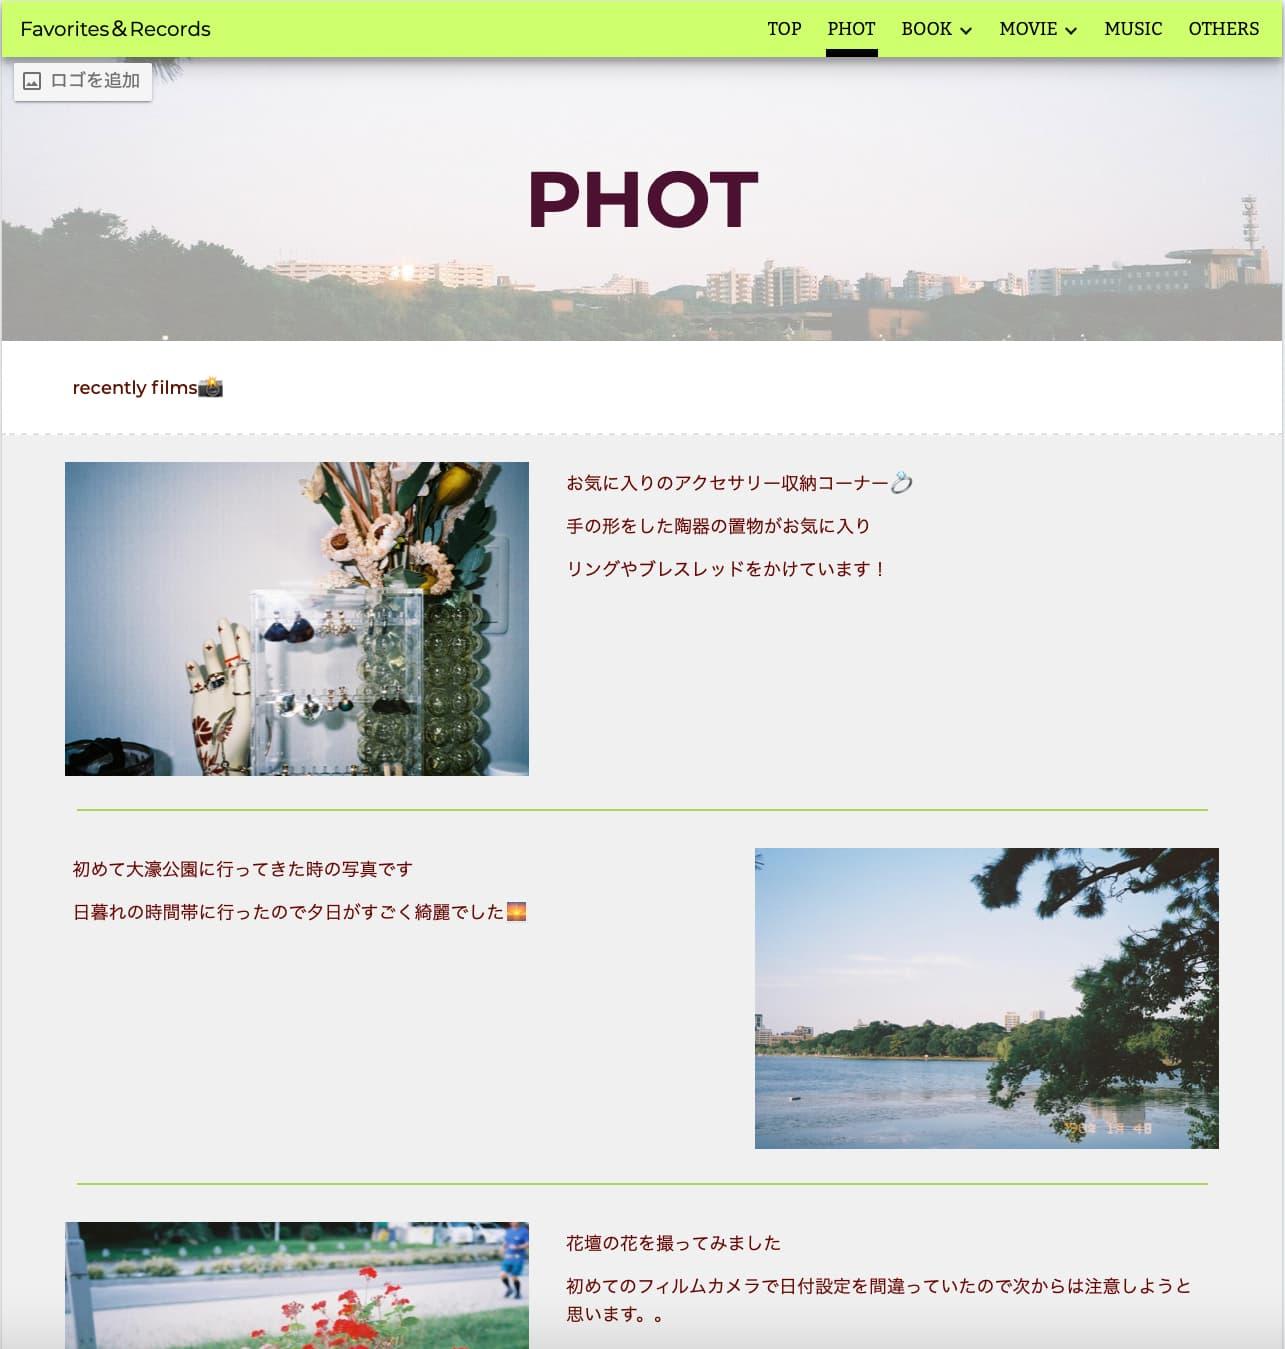 sitewireframe2.jpg